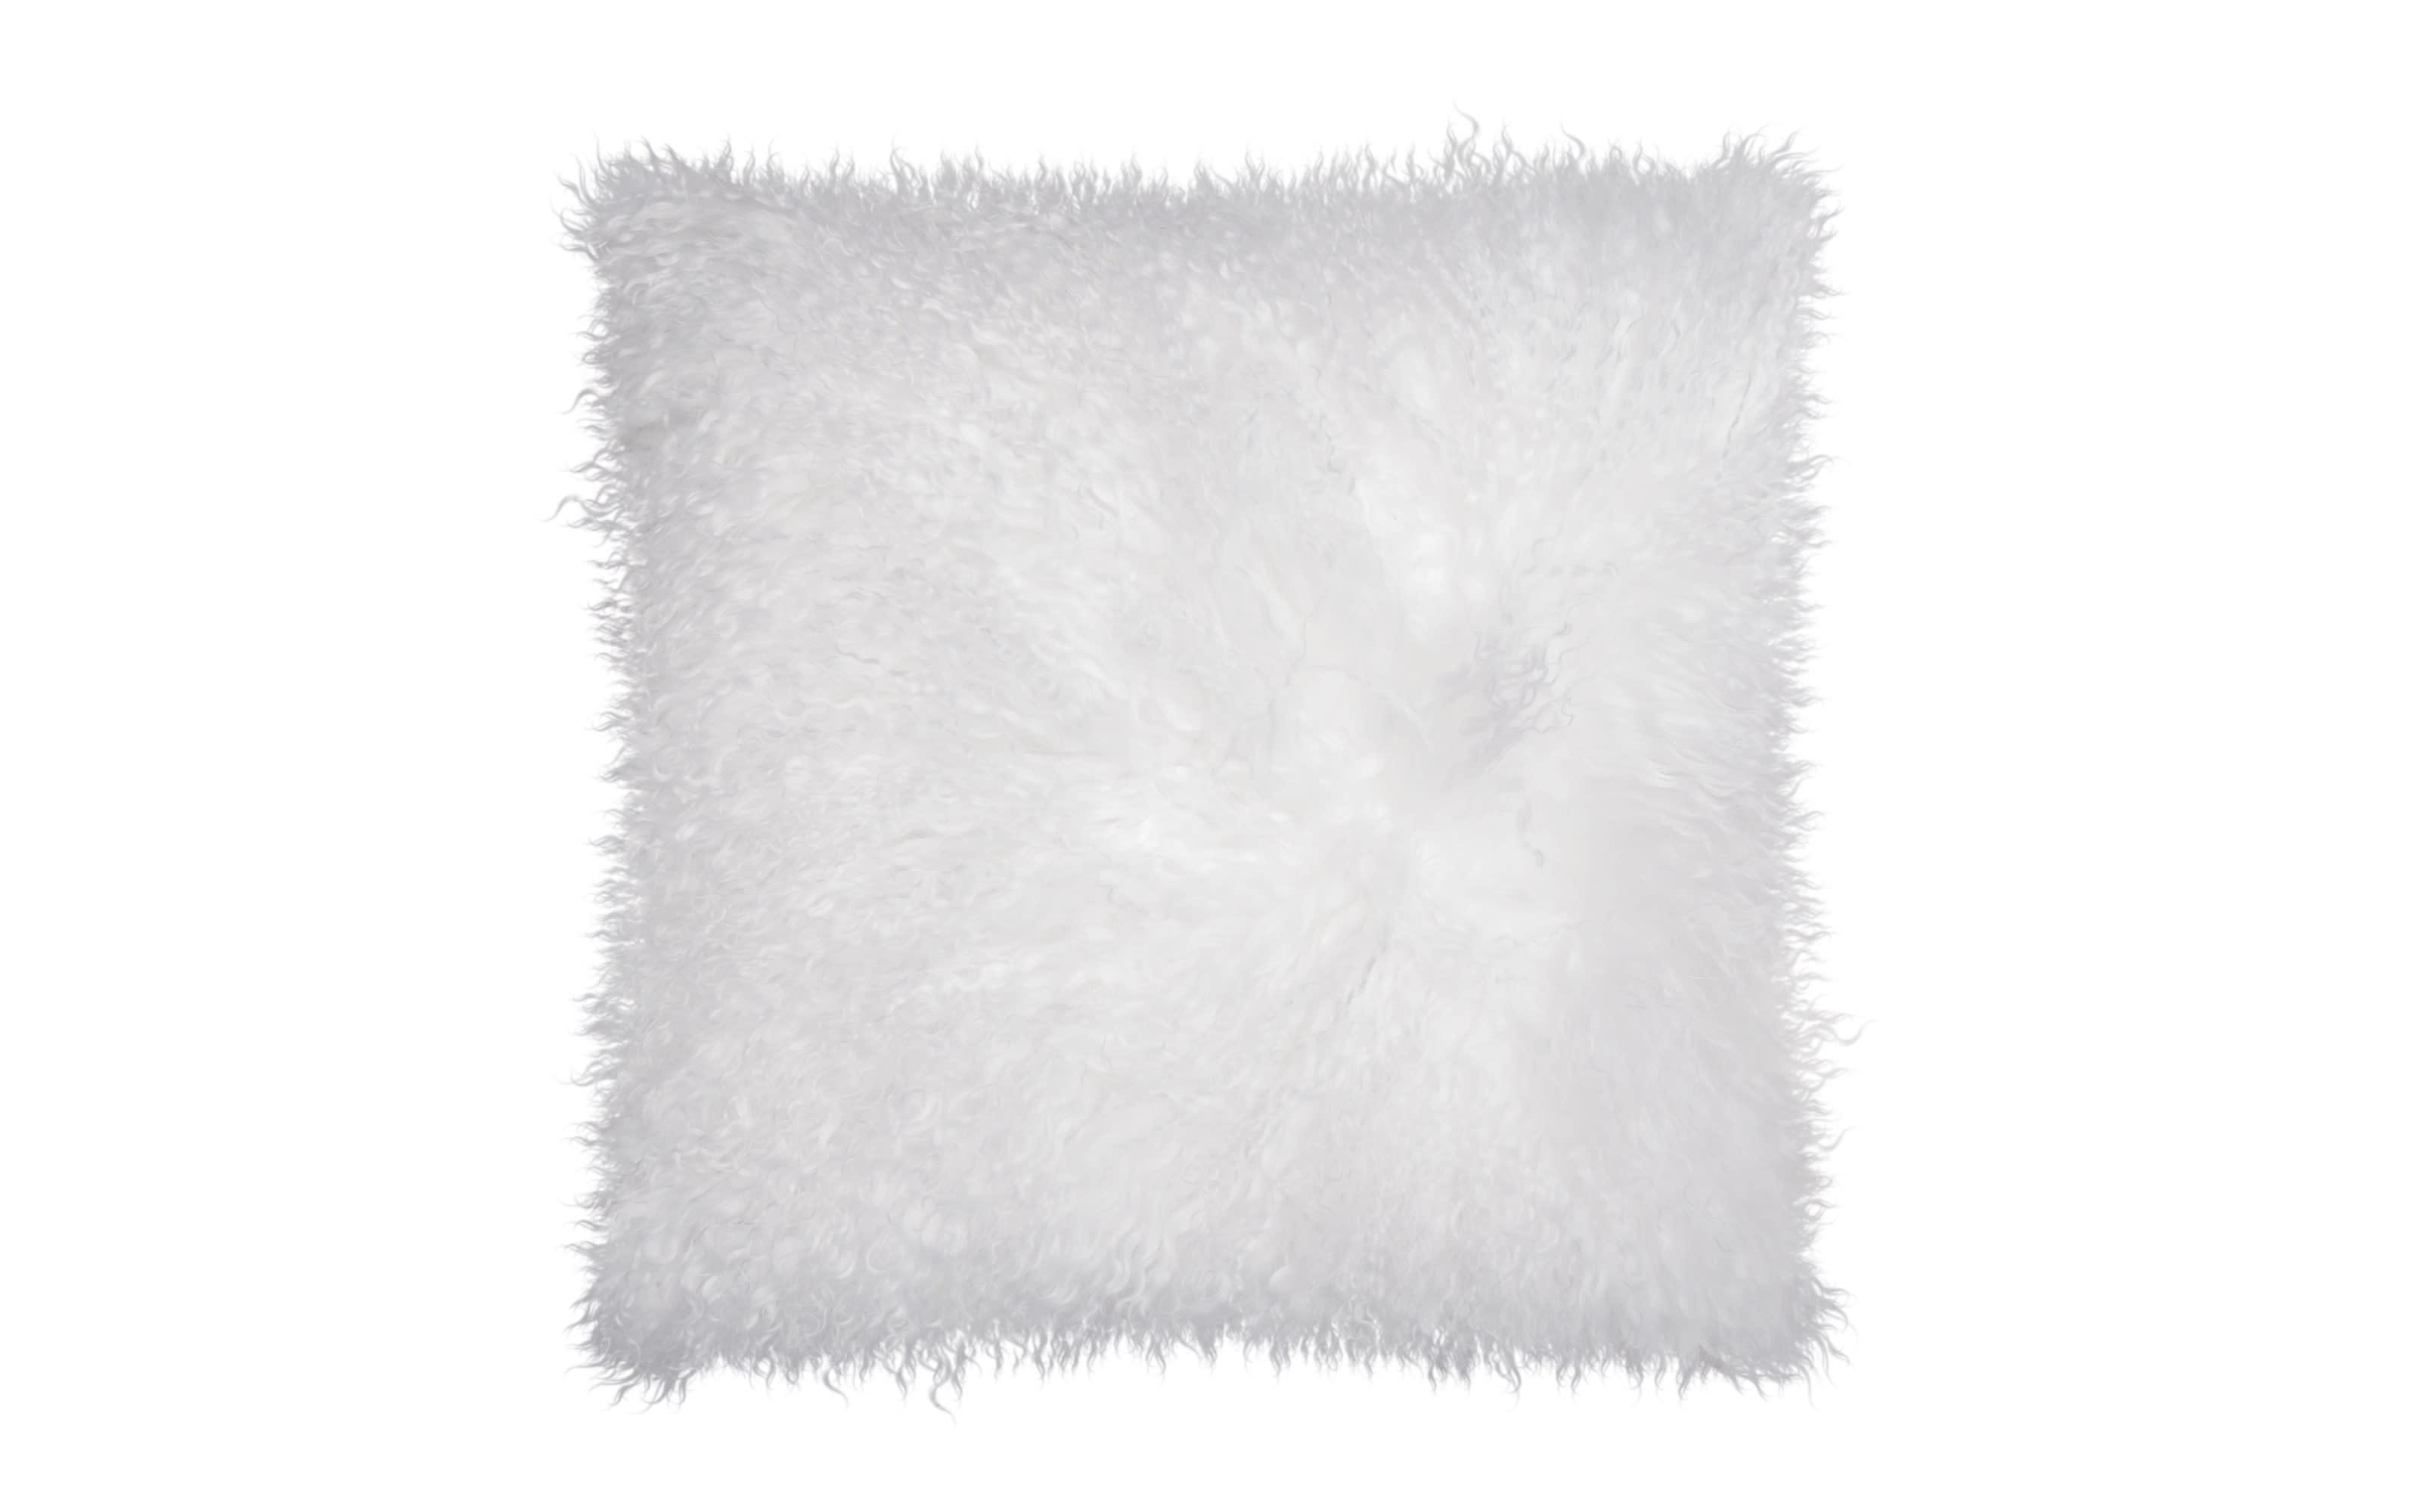 Kissenhülle Pamina in weiß, 40 x 40 cm